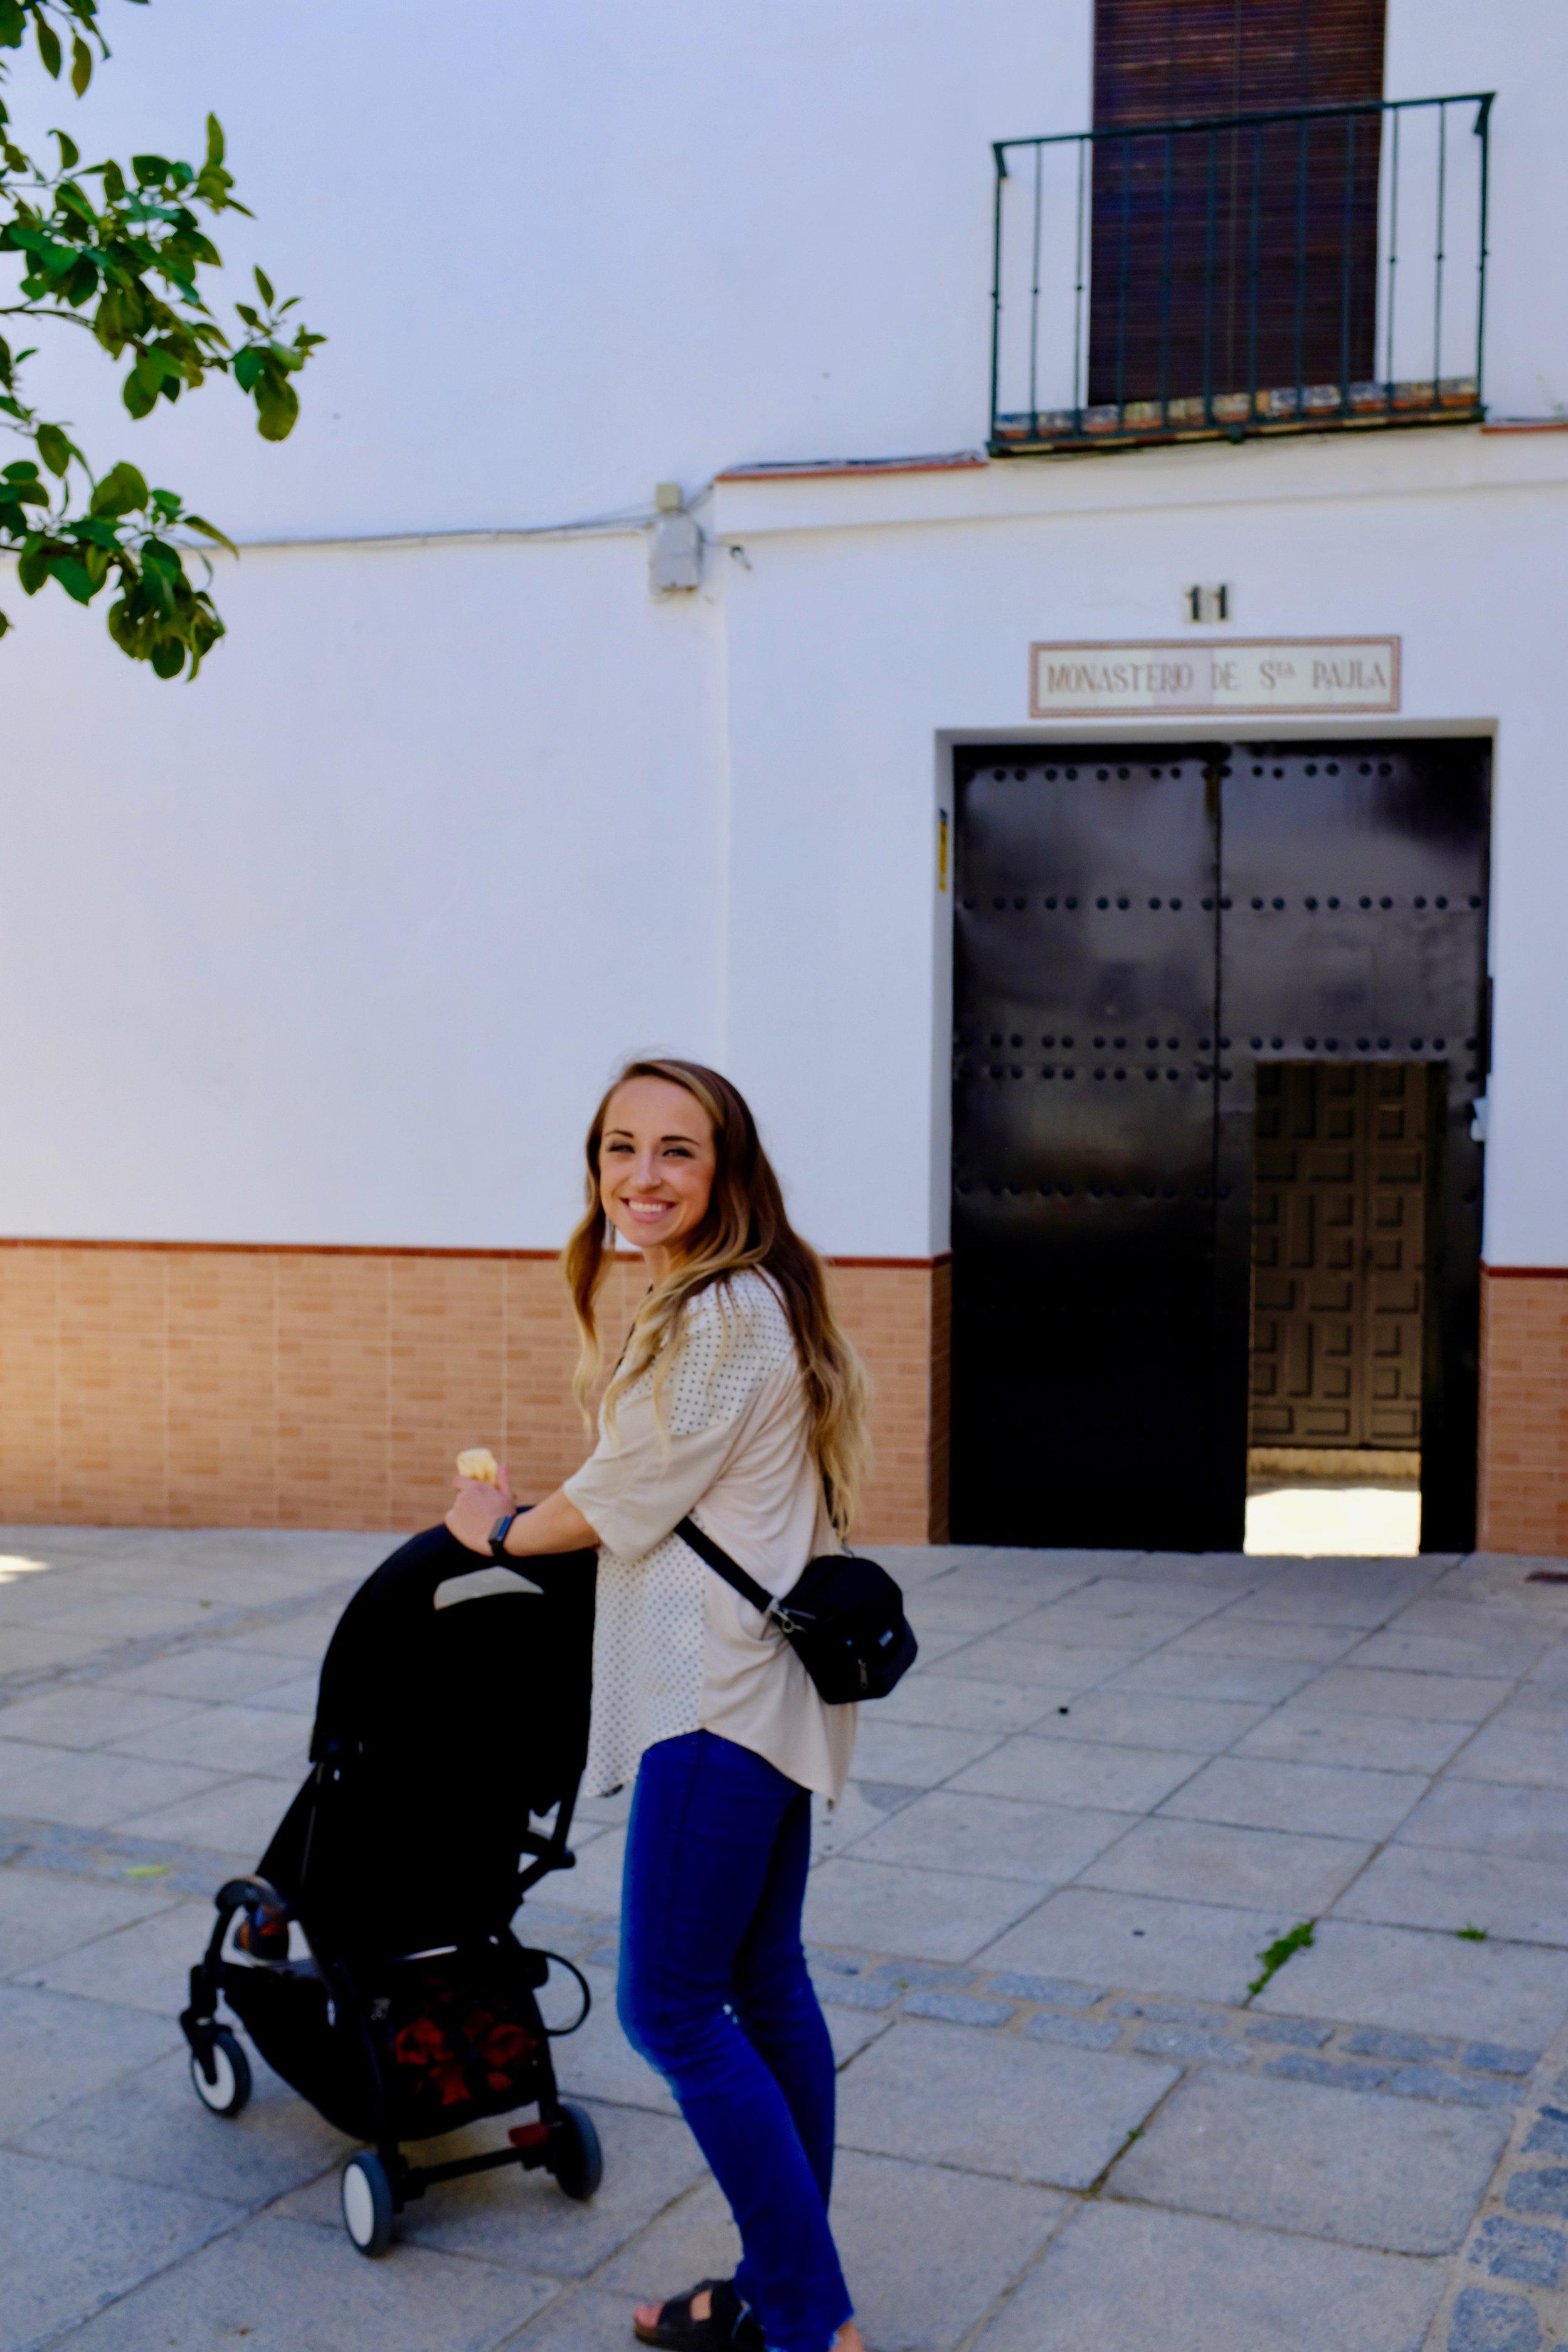 Visiting Convento de Santa Paula in Seville, Spain.